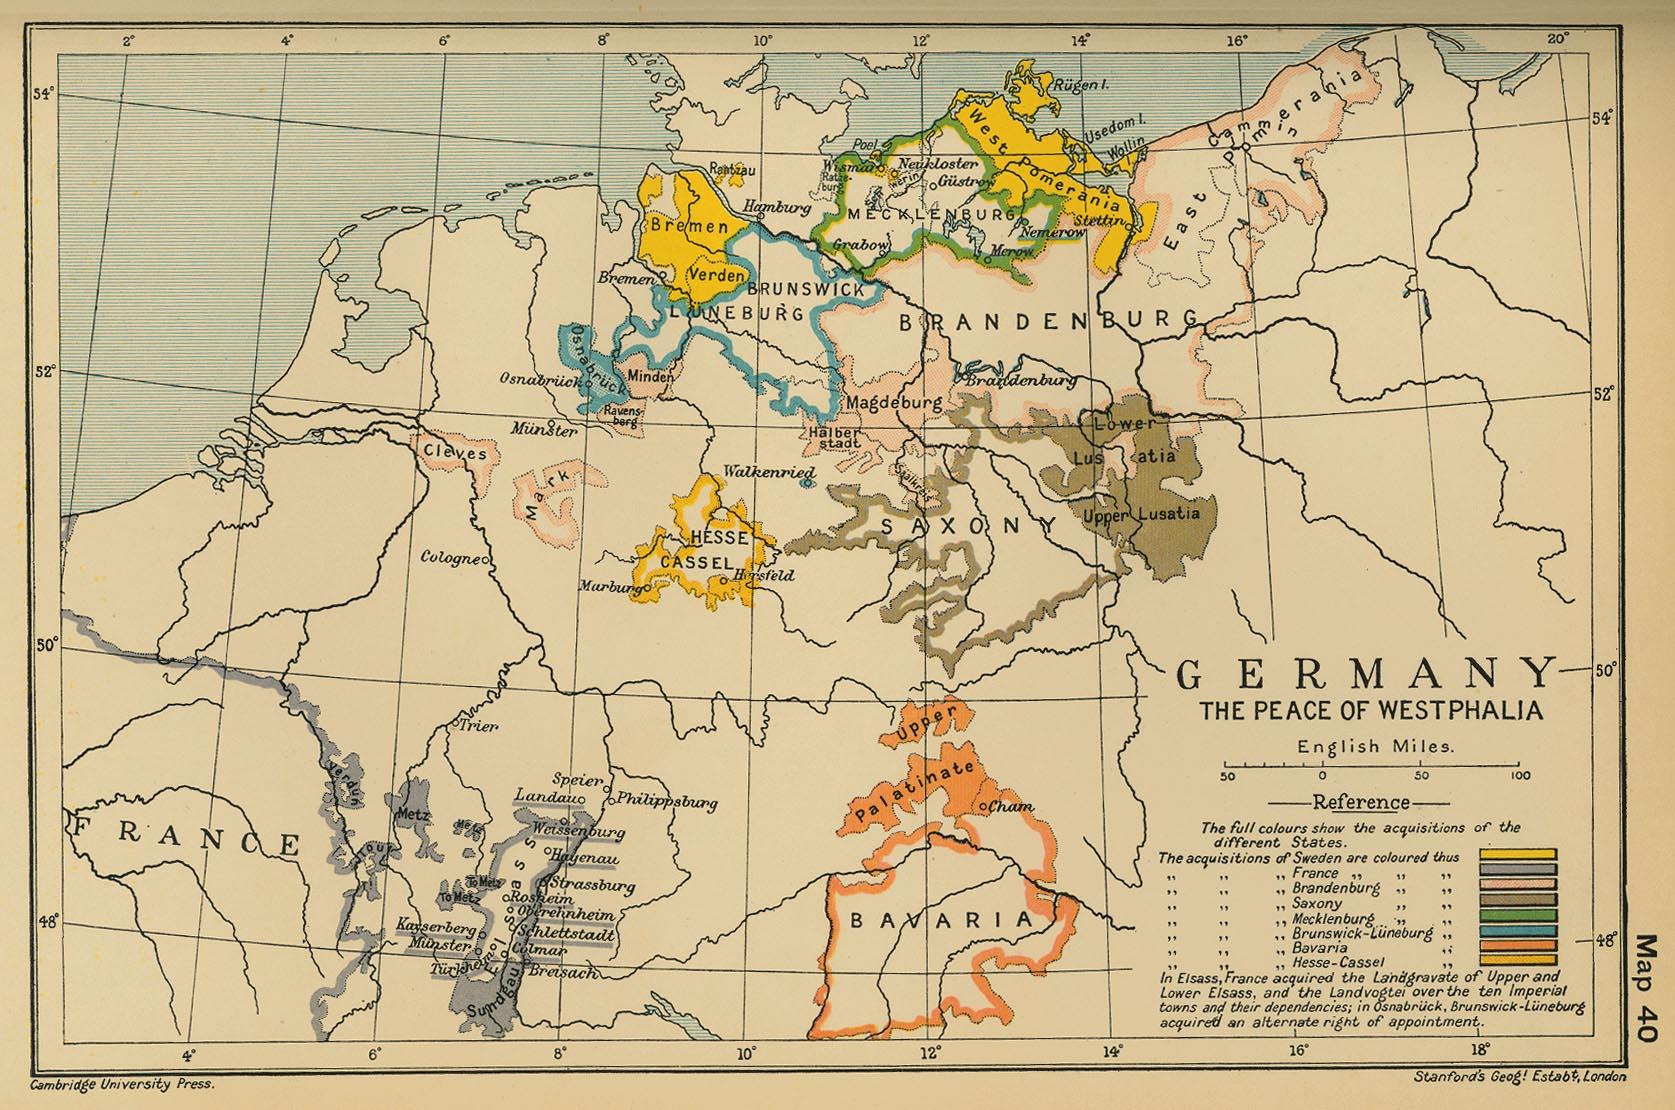 Germany: The Peace of Westphalia 1648